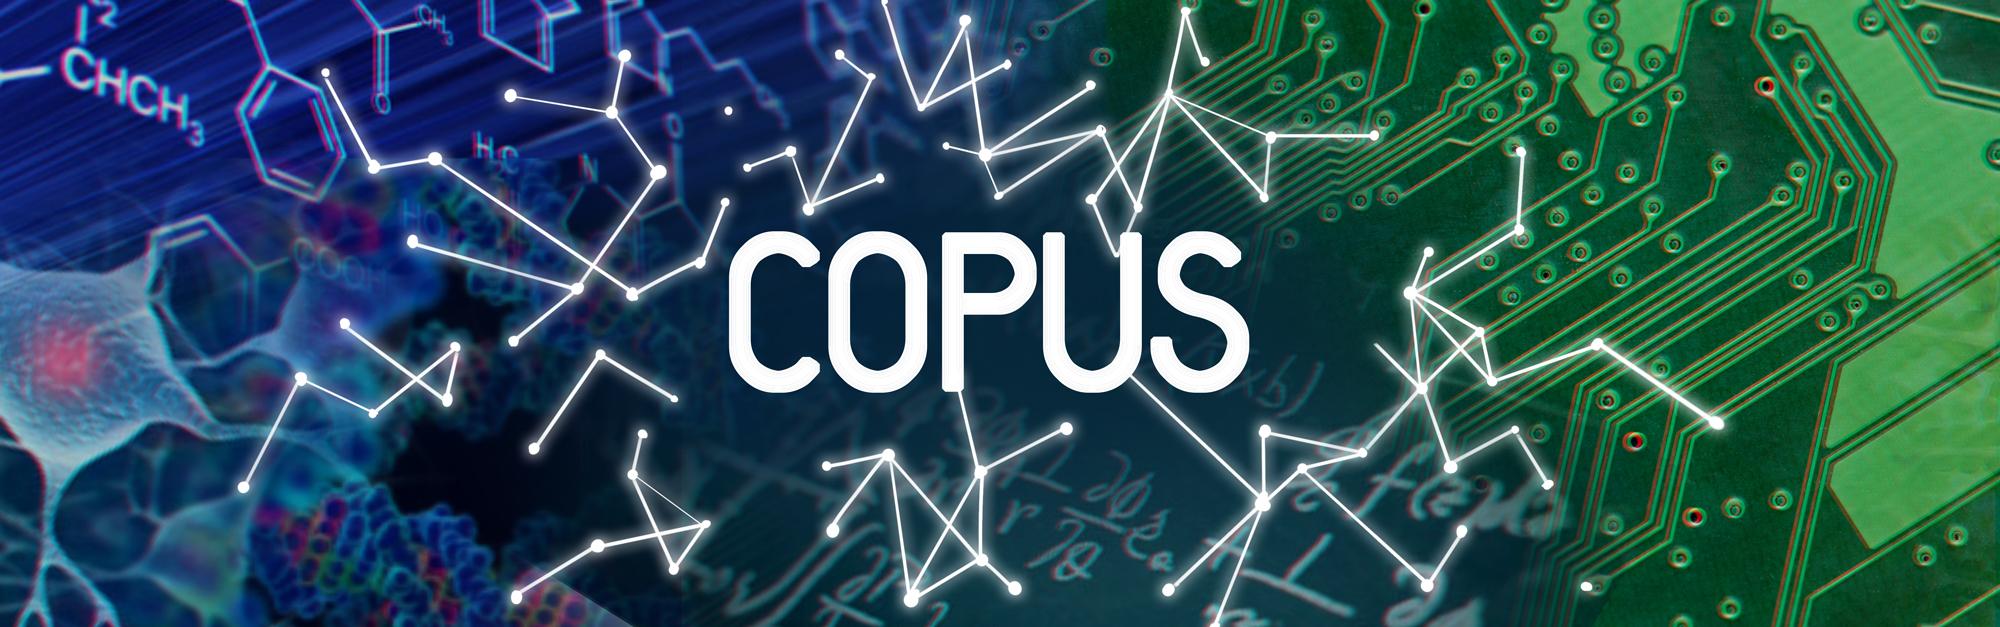 copus_banner.jpg